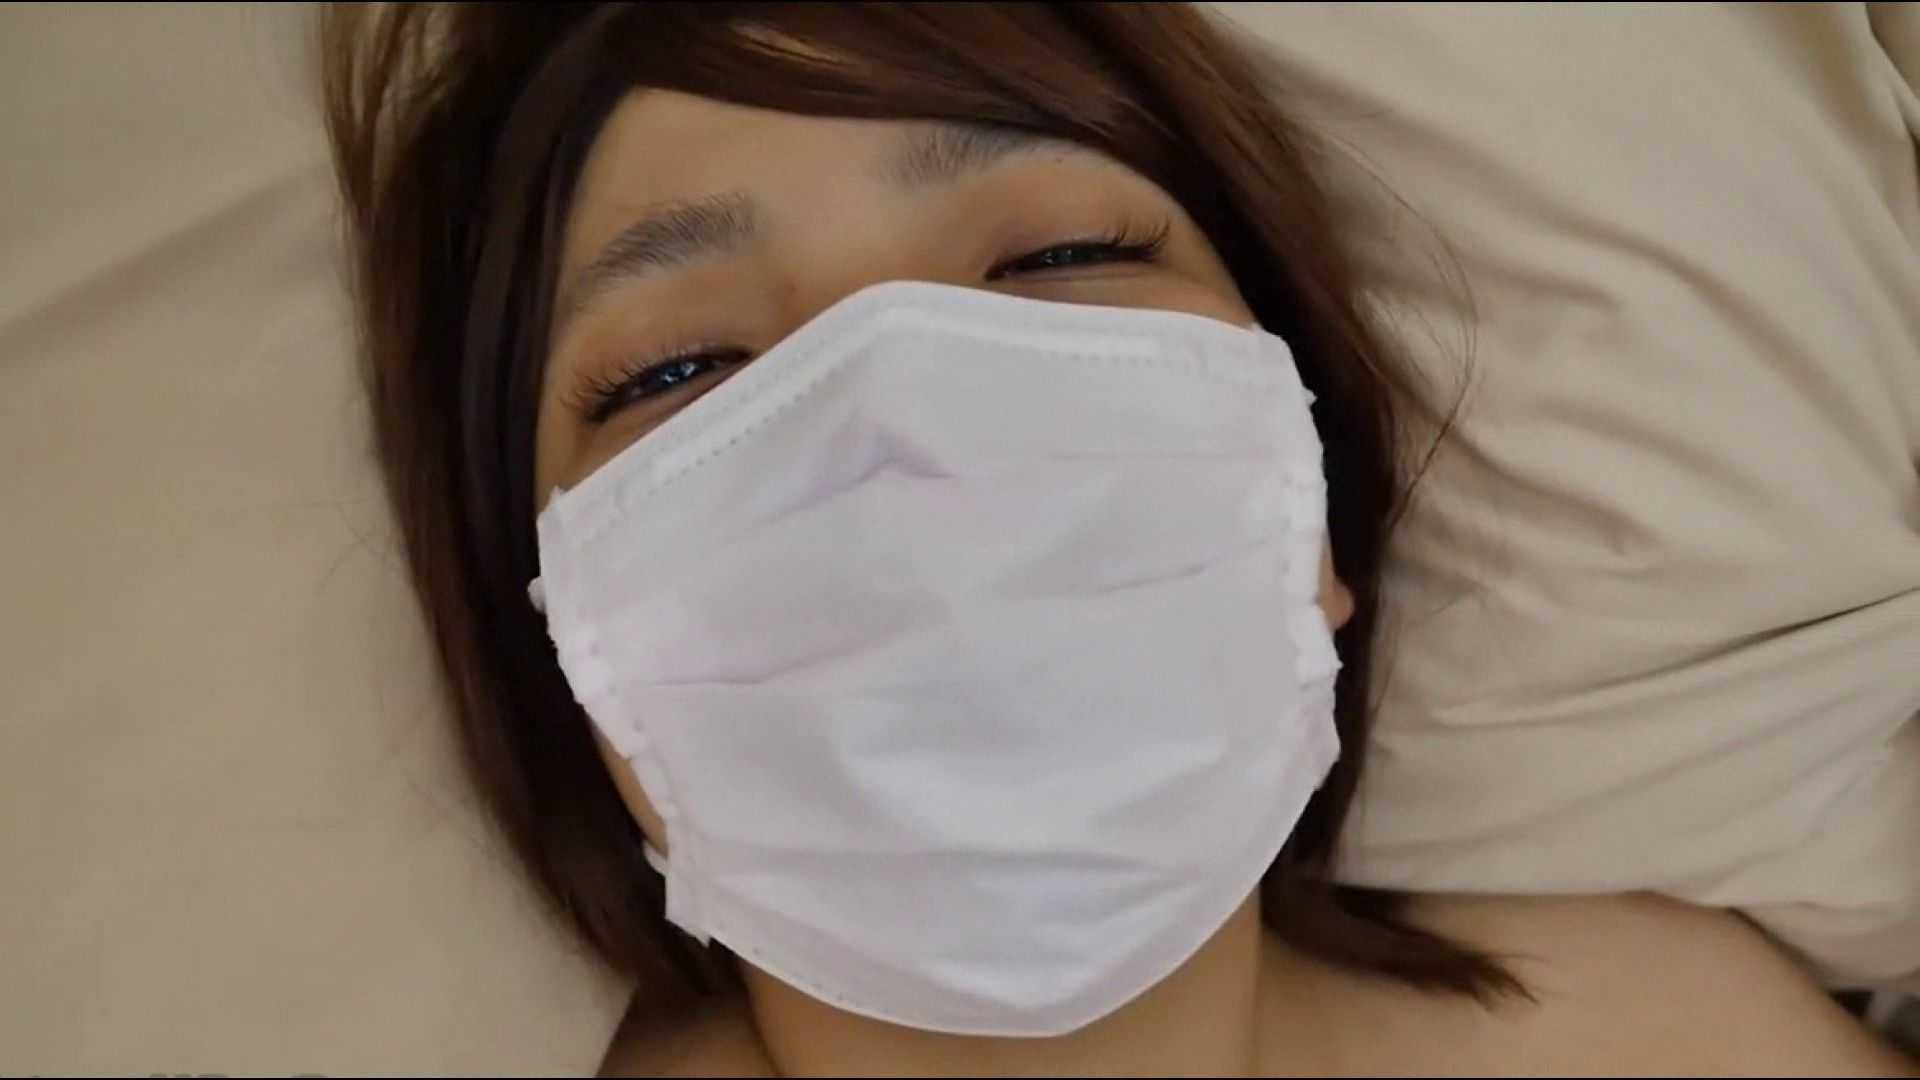 S級厳選美女ビッチガールVol.41 後編 OLセックス | 美女ヌード  51画像 13